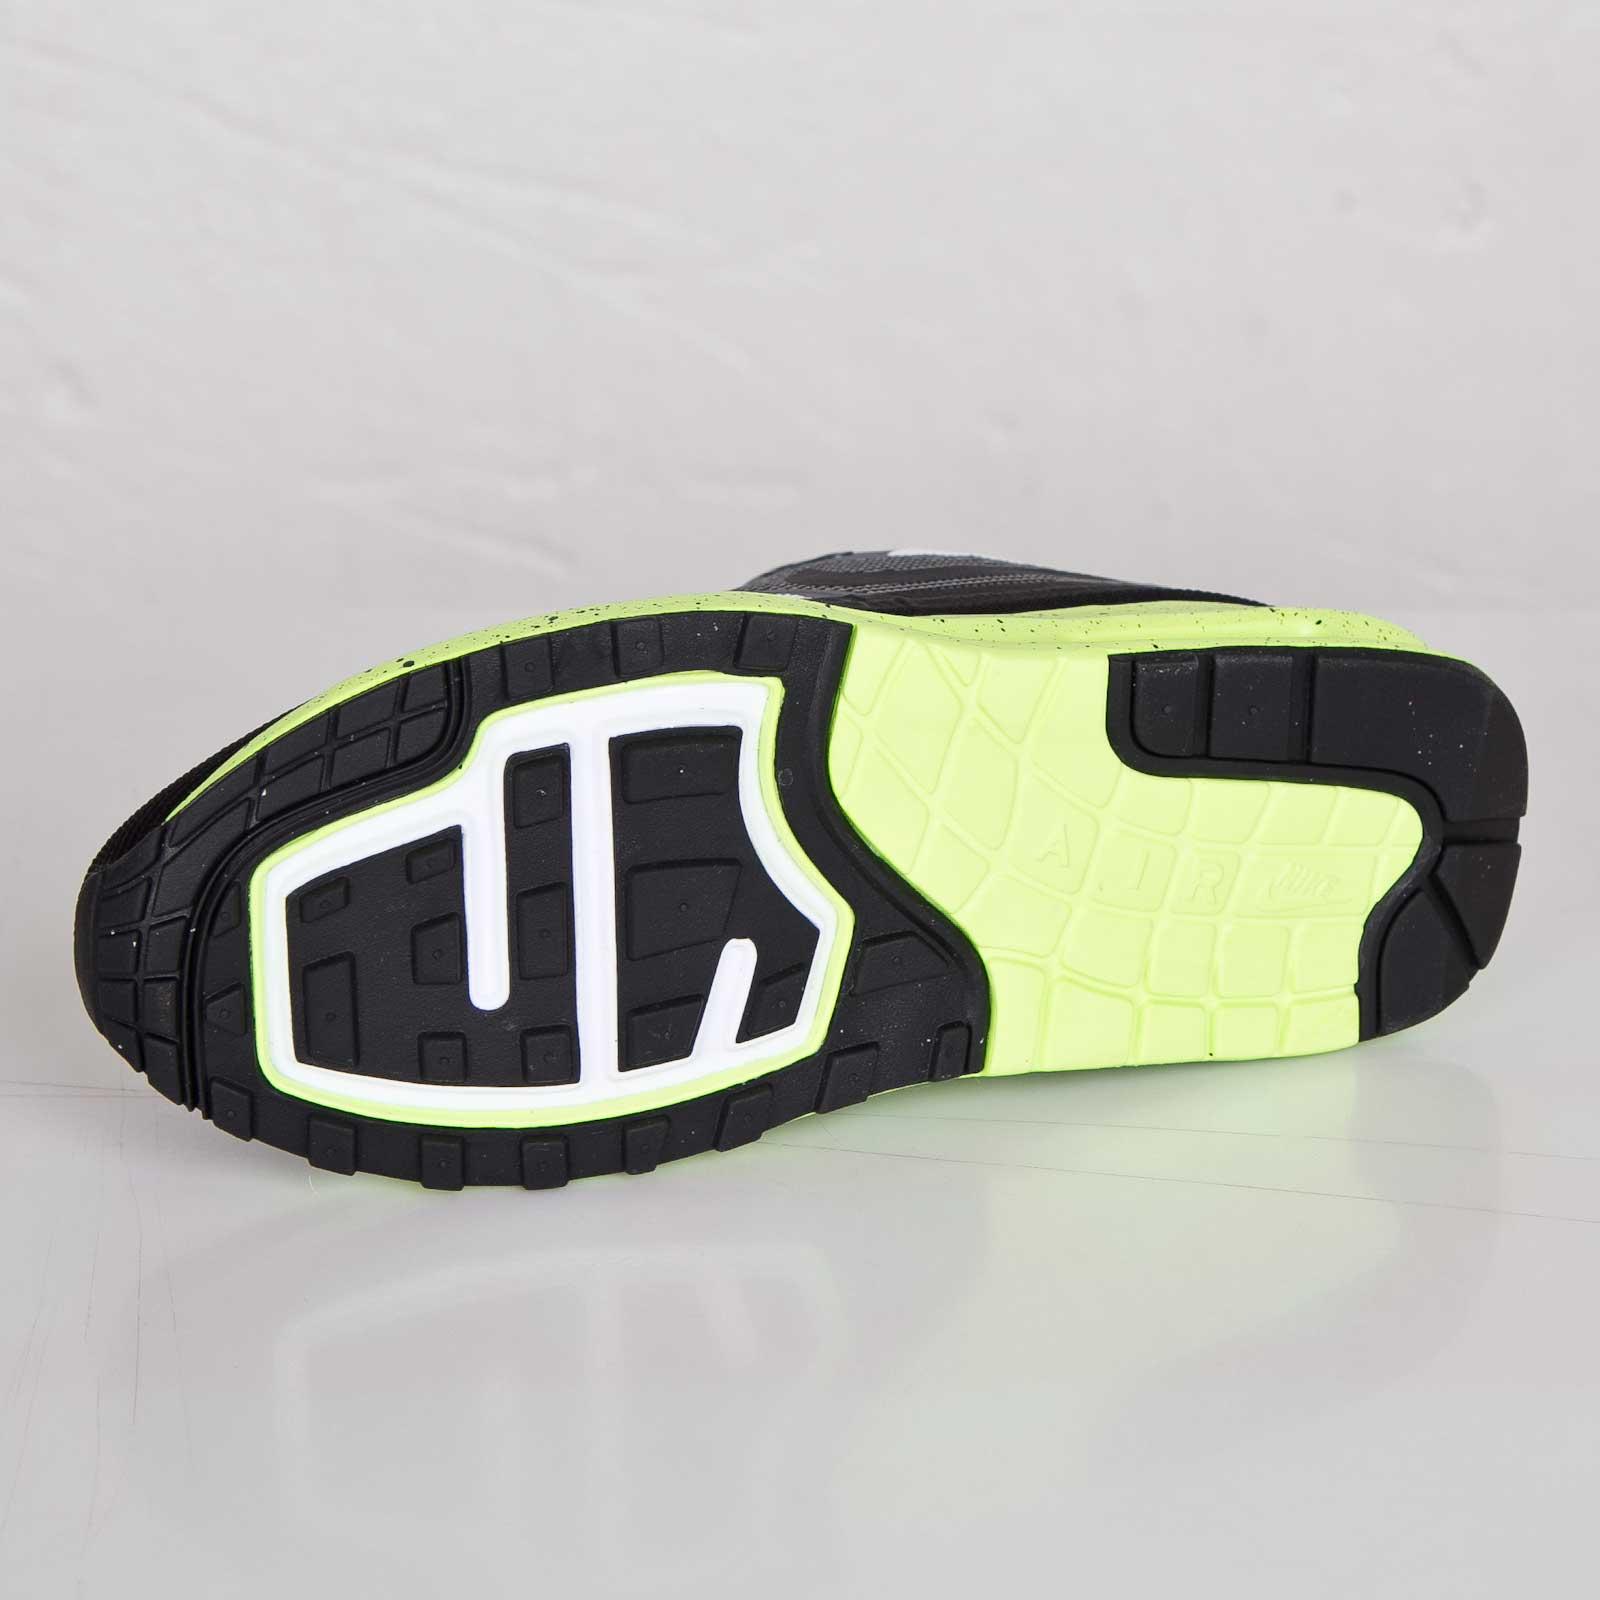 promo code 66730 e5b3b Nike Air Max Lunar1 - 654469-100 - Sneakersnstuff | sneakers & streetwear  online since 1999